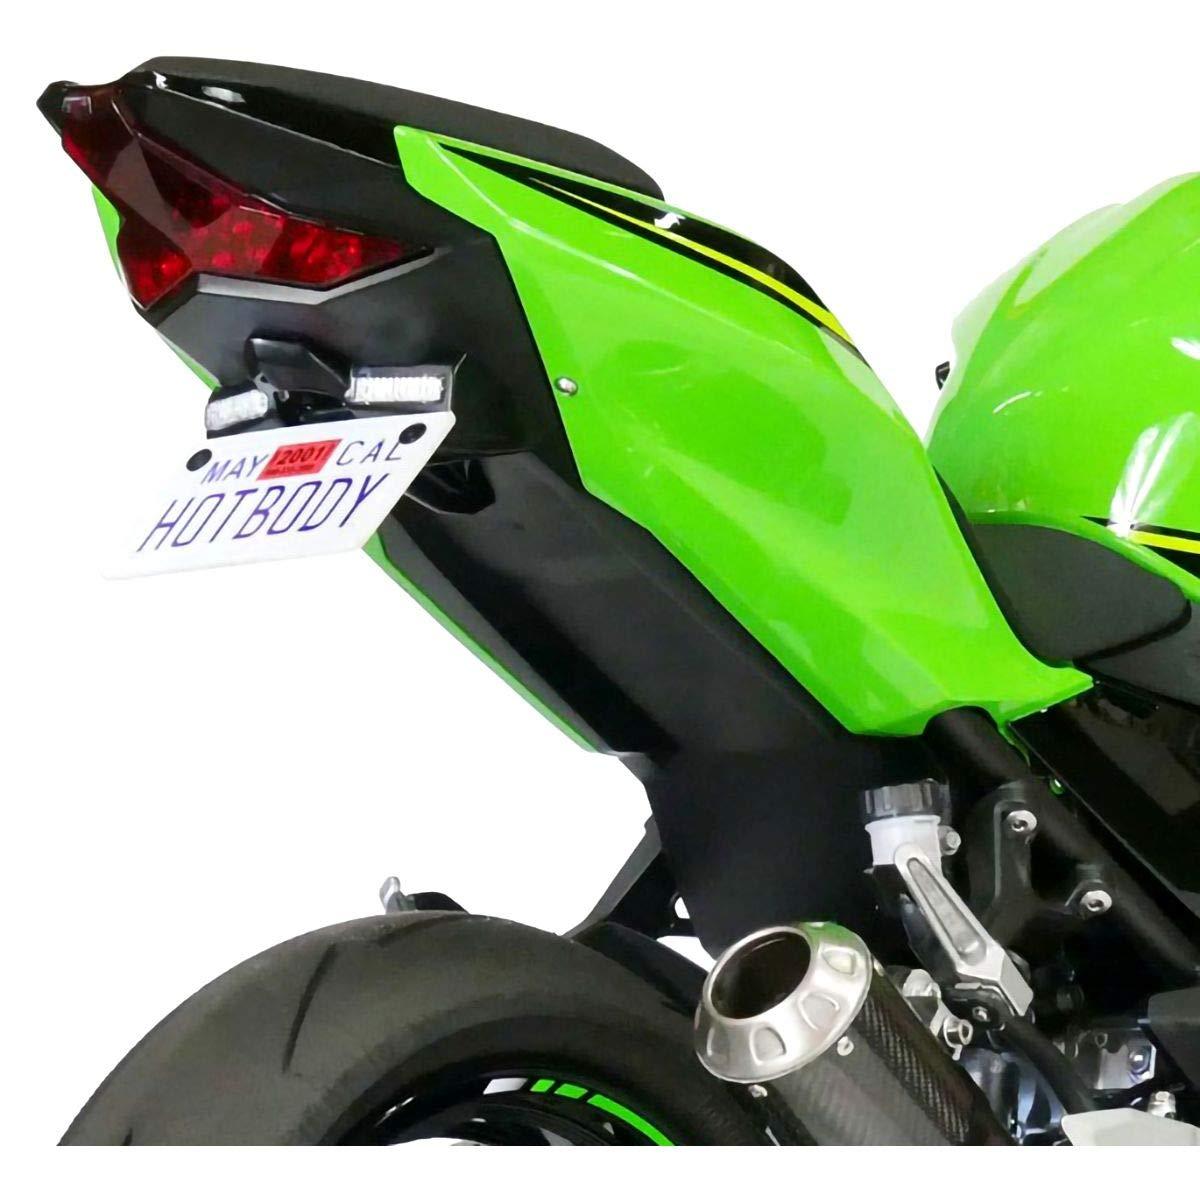 Hotbodies Racing 18-20 Kawasaki EX400ABS TAG Fender Eliminator Kit